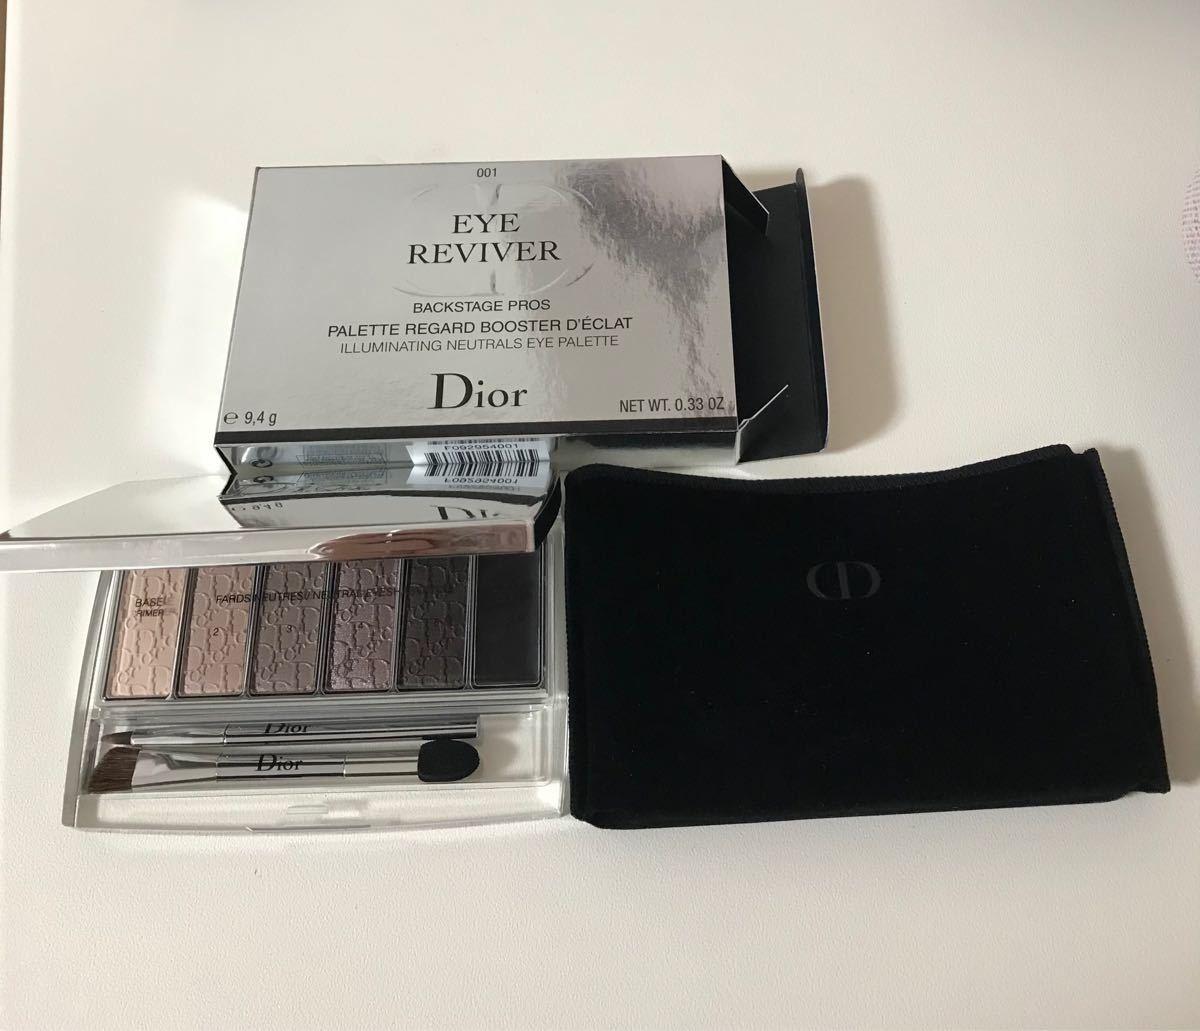 Dior ディオール アイシャドウ パレット 001 未使用 クリスチャンディオール  クリスチャンディオール